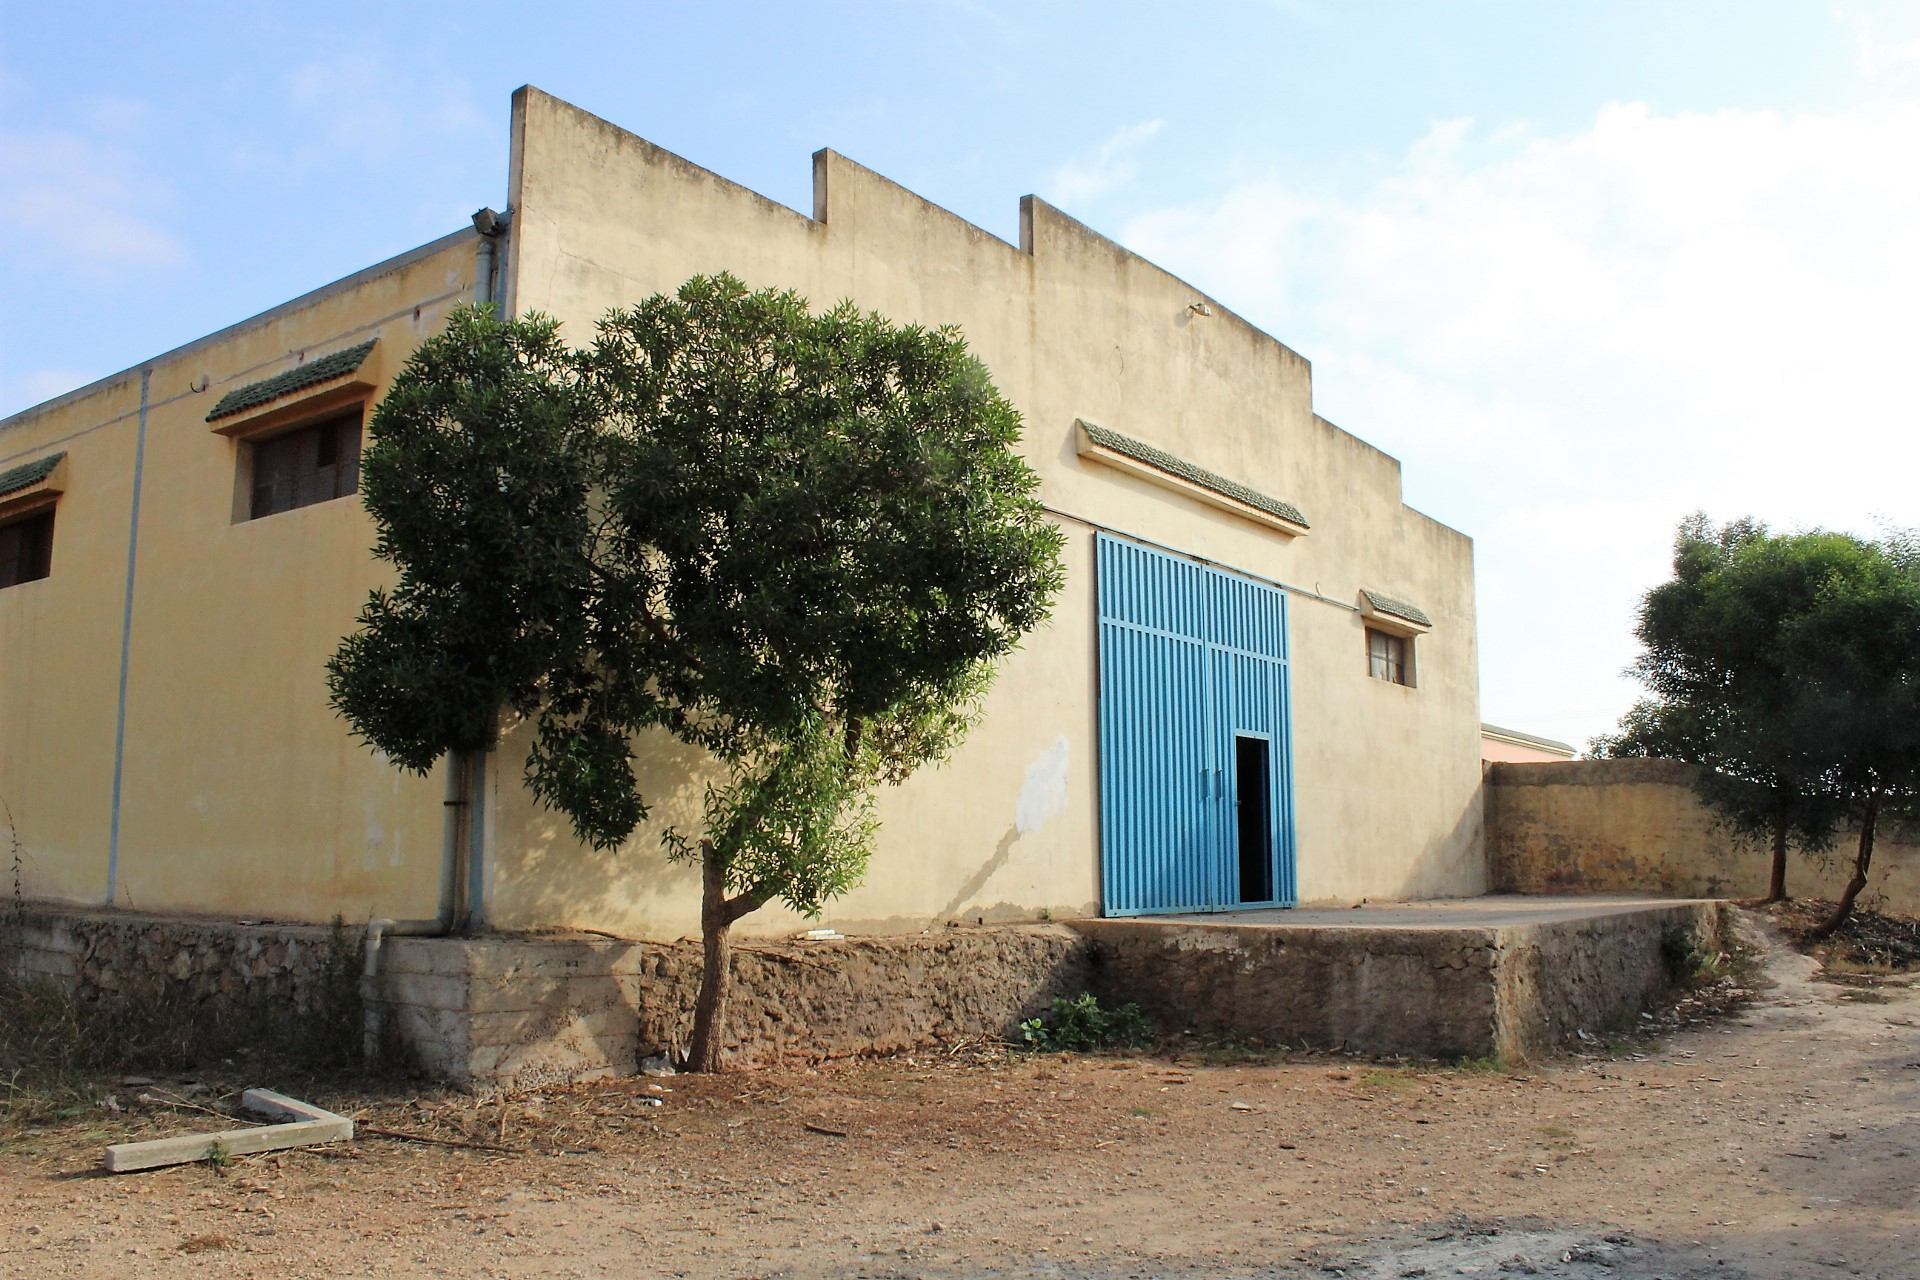 Maroc, Casablanca, secteur abdelmoumen proche tram,  à louer bureau moderne de 150 M²